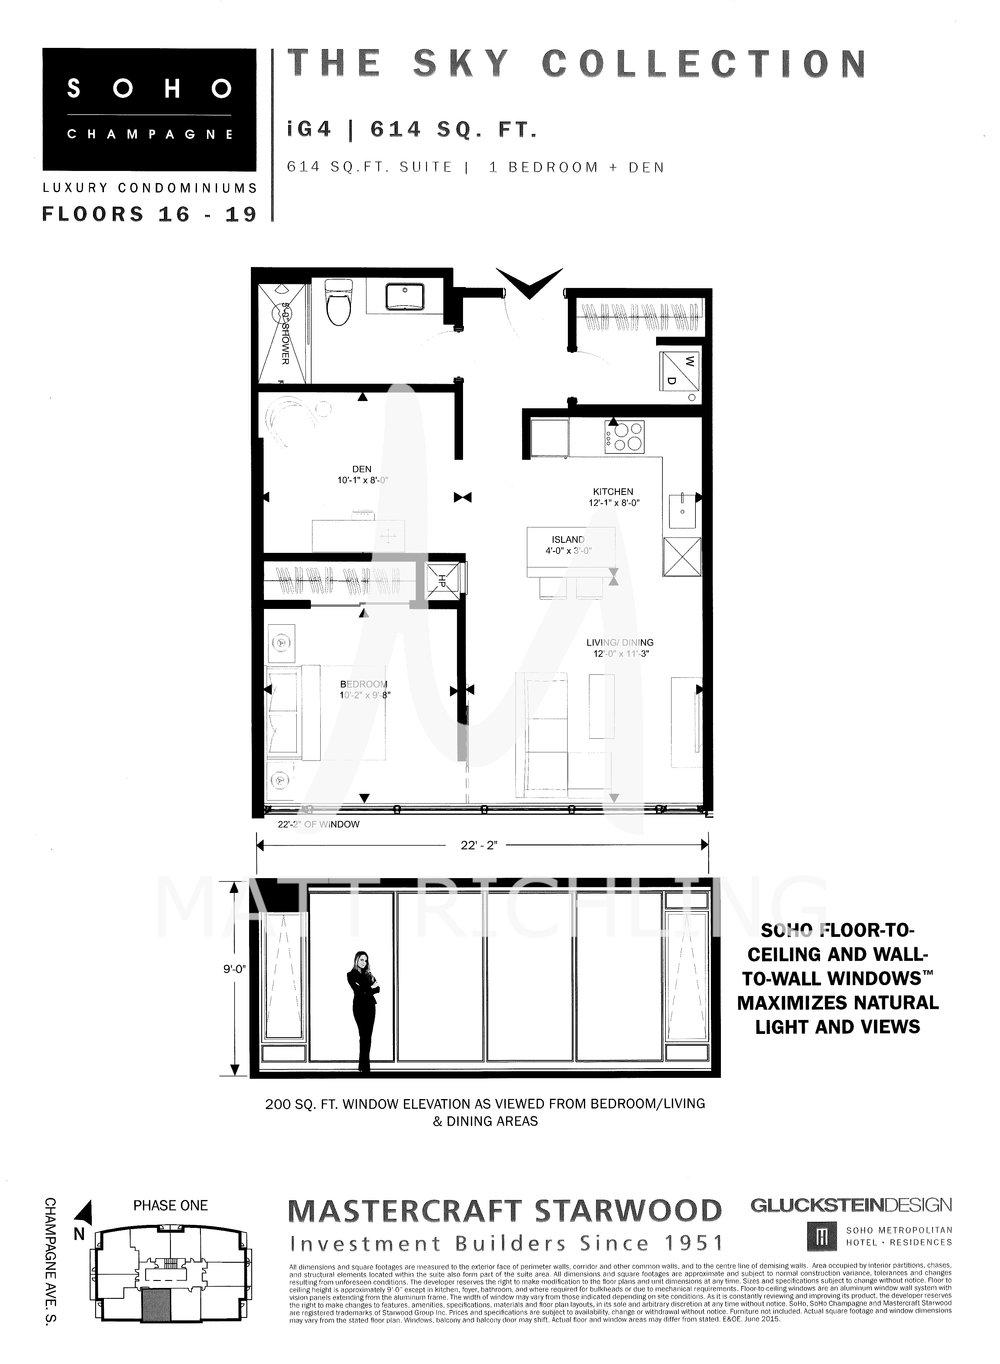 IG4---1-Bed-+-Den---Floors-16-19.jpg